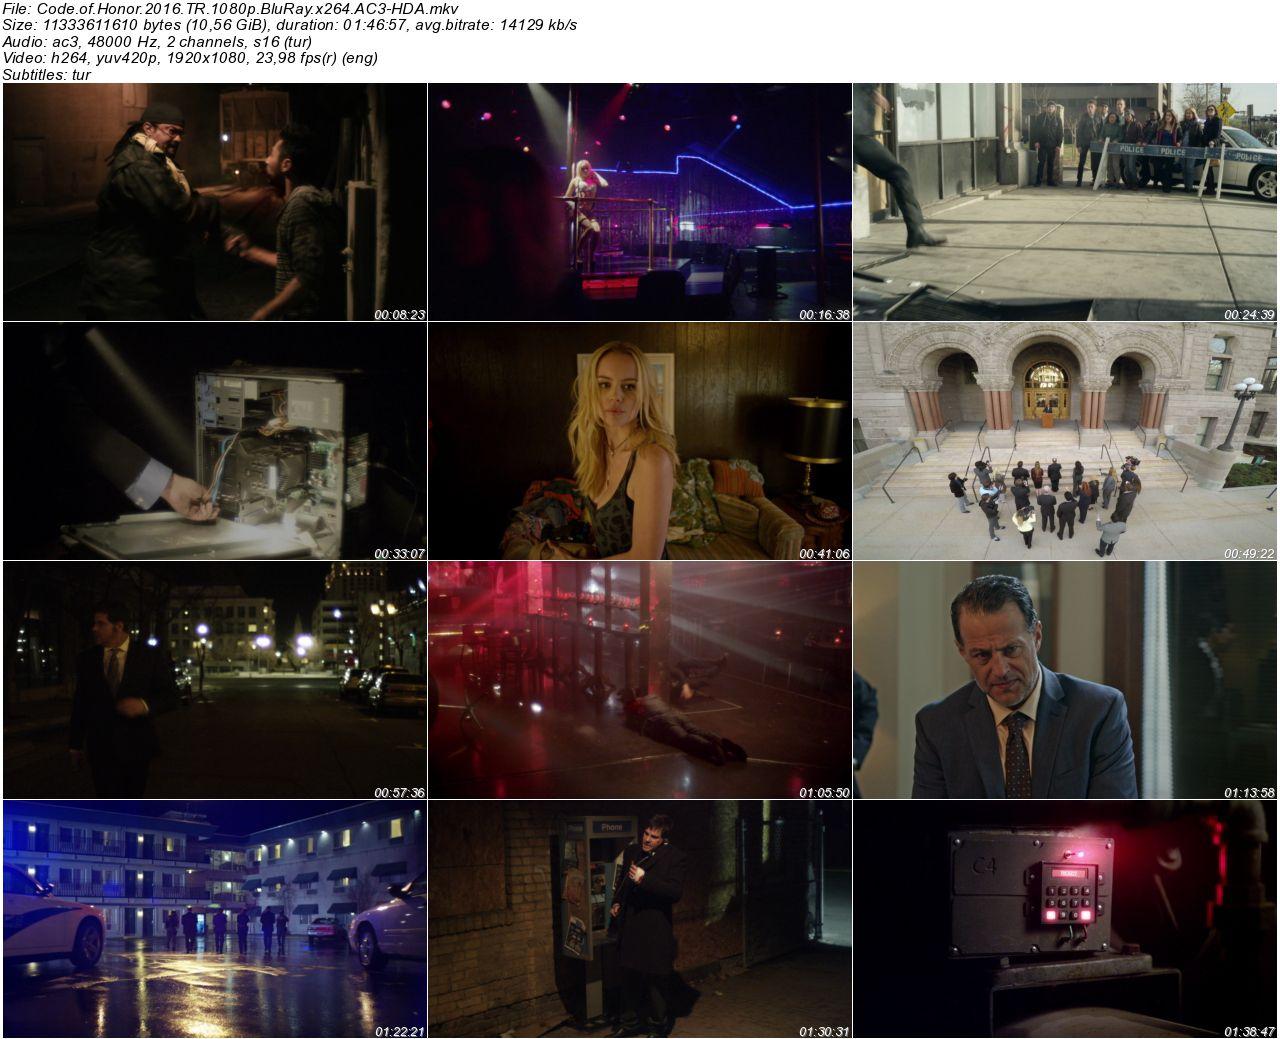 Code of Honor 2016 - 1080p 720p 480p - Türkçe Dublaj Tek Link indir